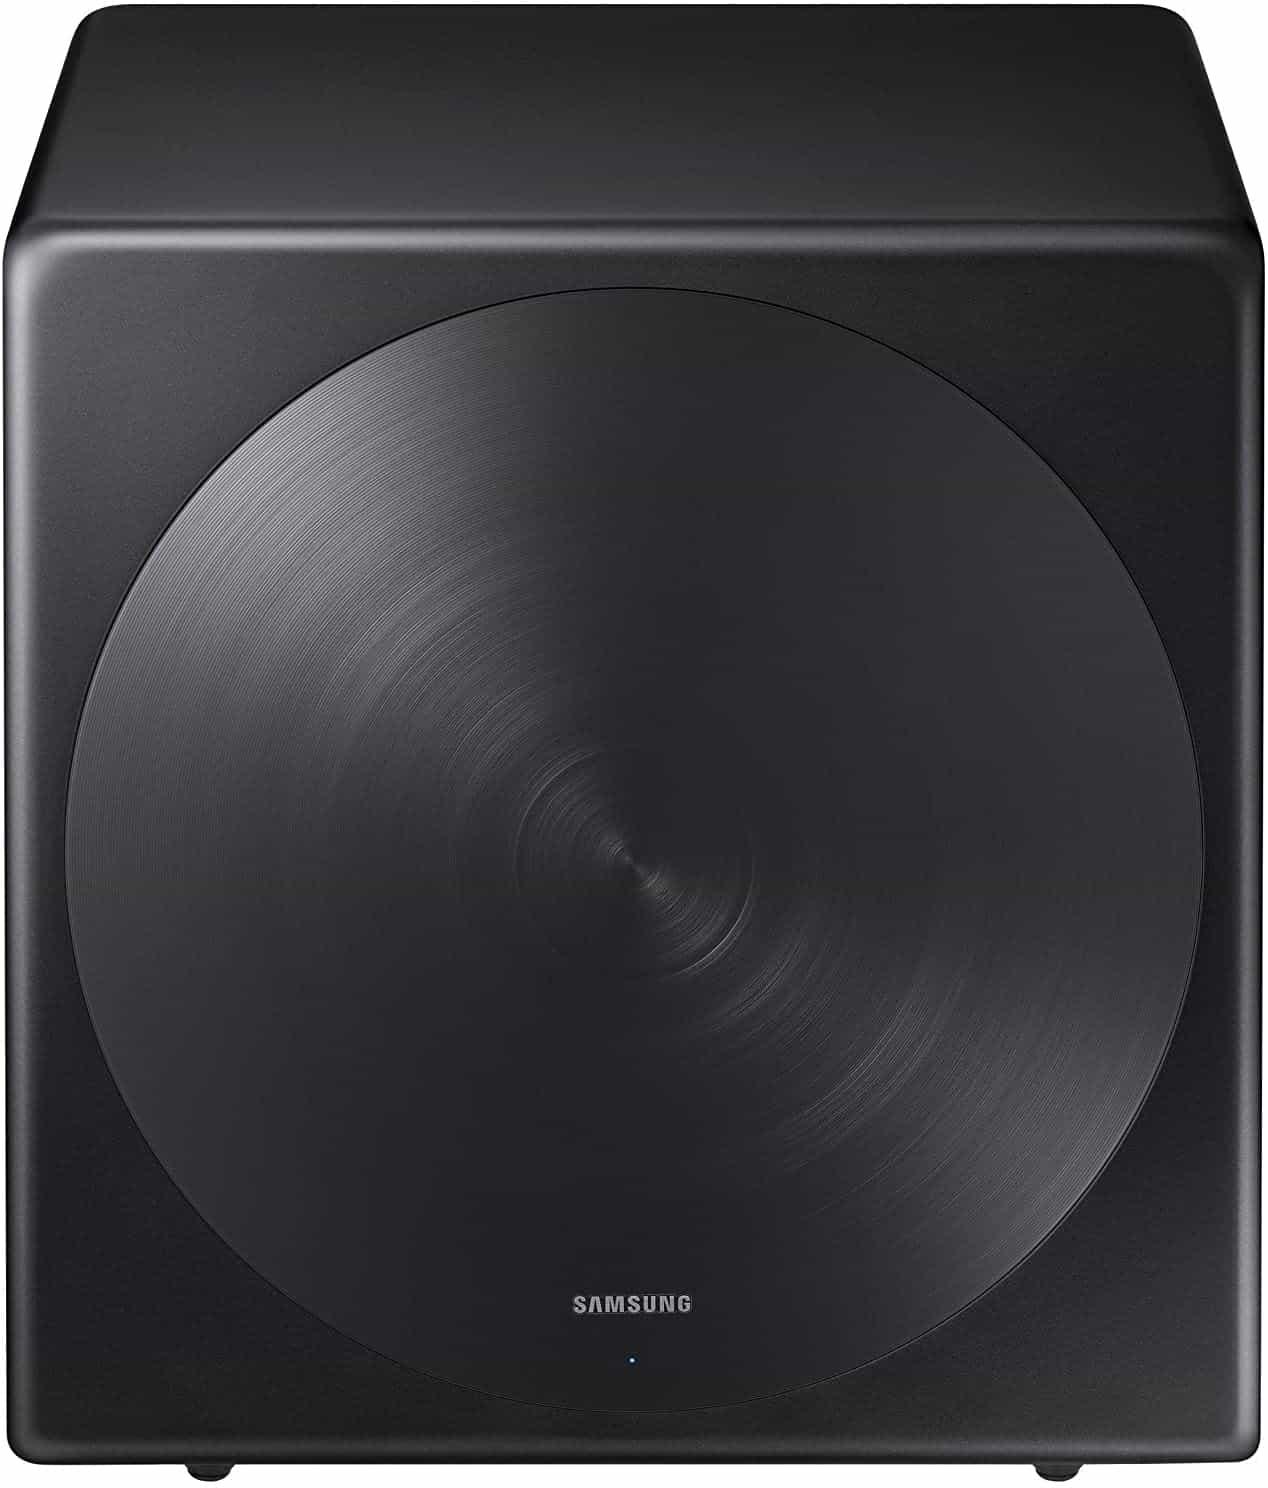 Samsung Sound+ SWA-W700 Wireless Subwoofer